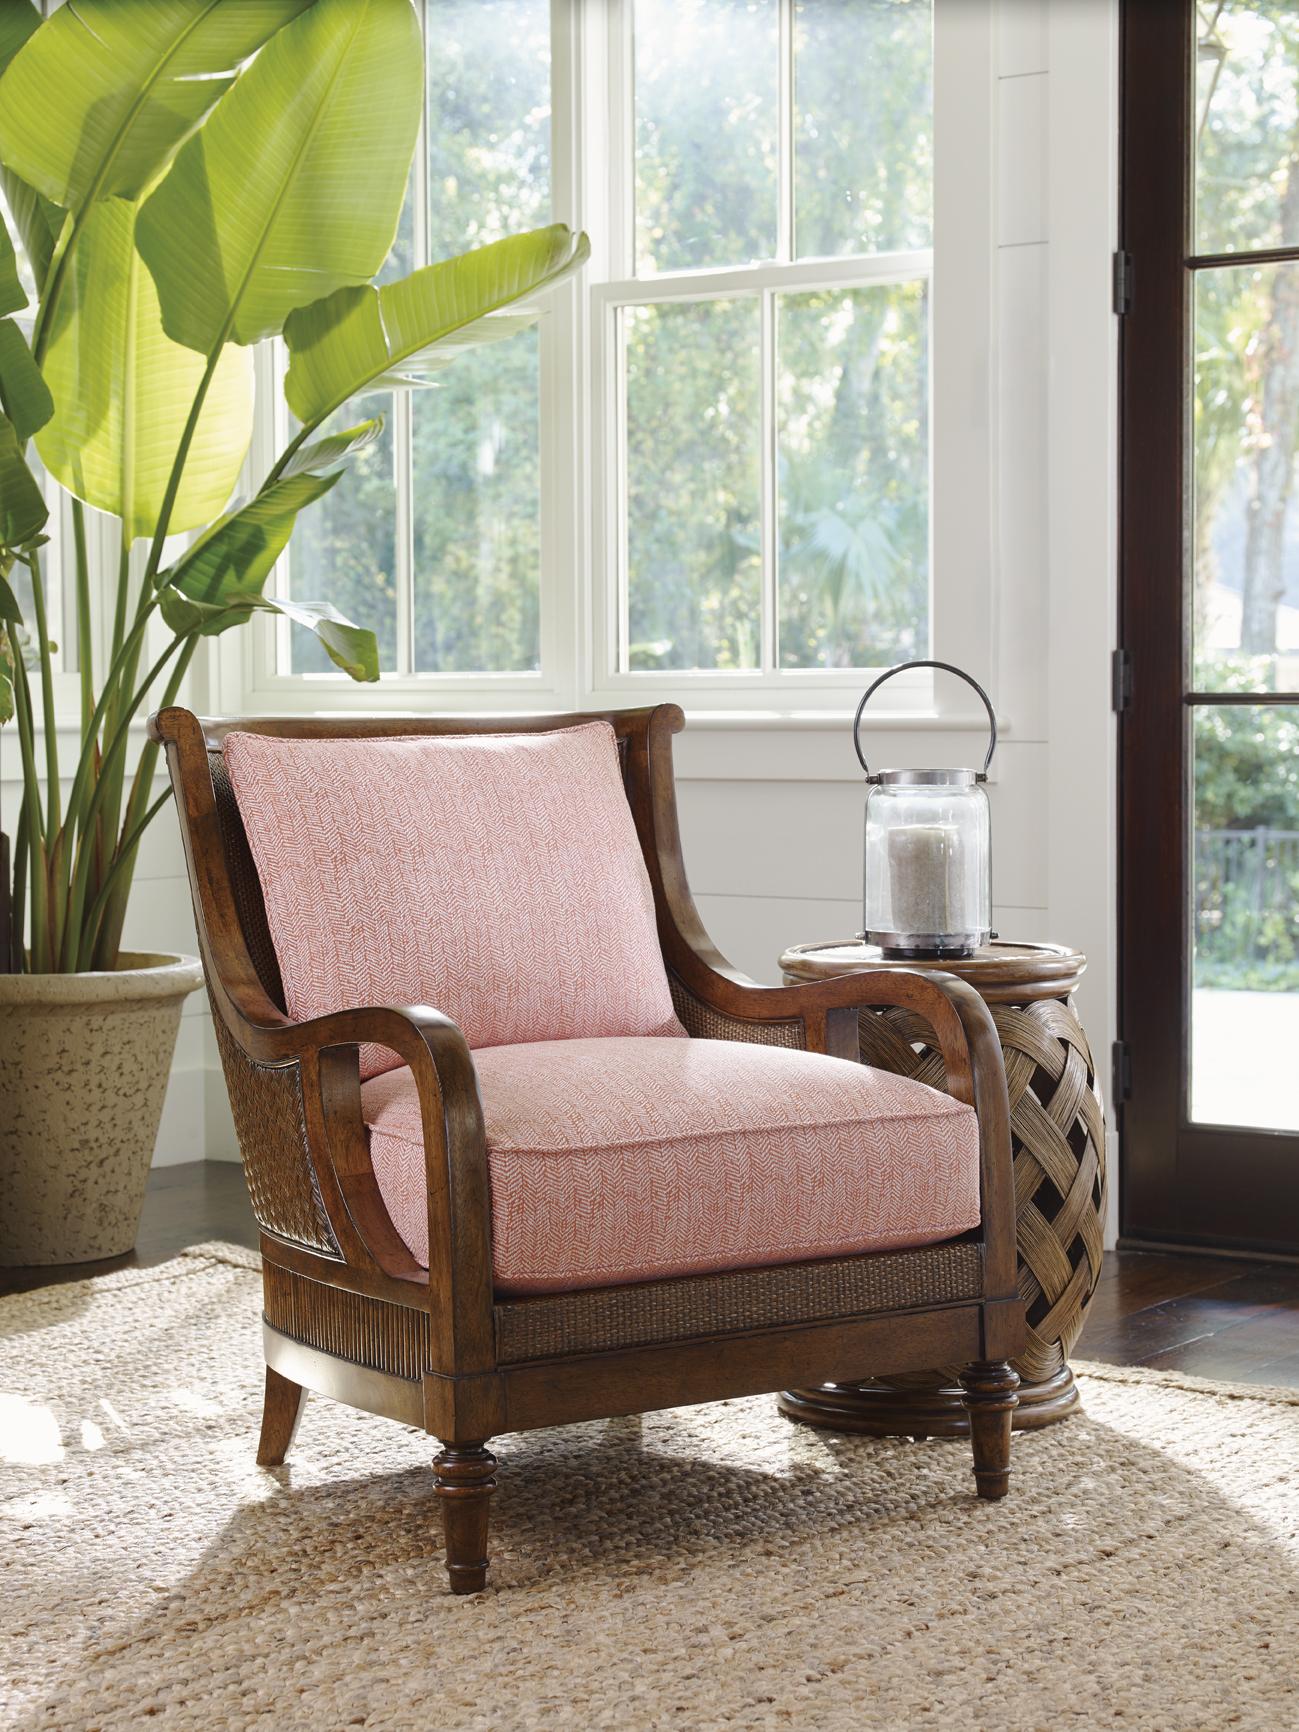 Where Is Bali Hai Island bali hai island paradise chair – bronze lady home furnishings